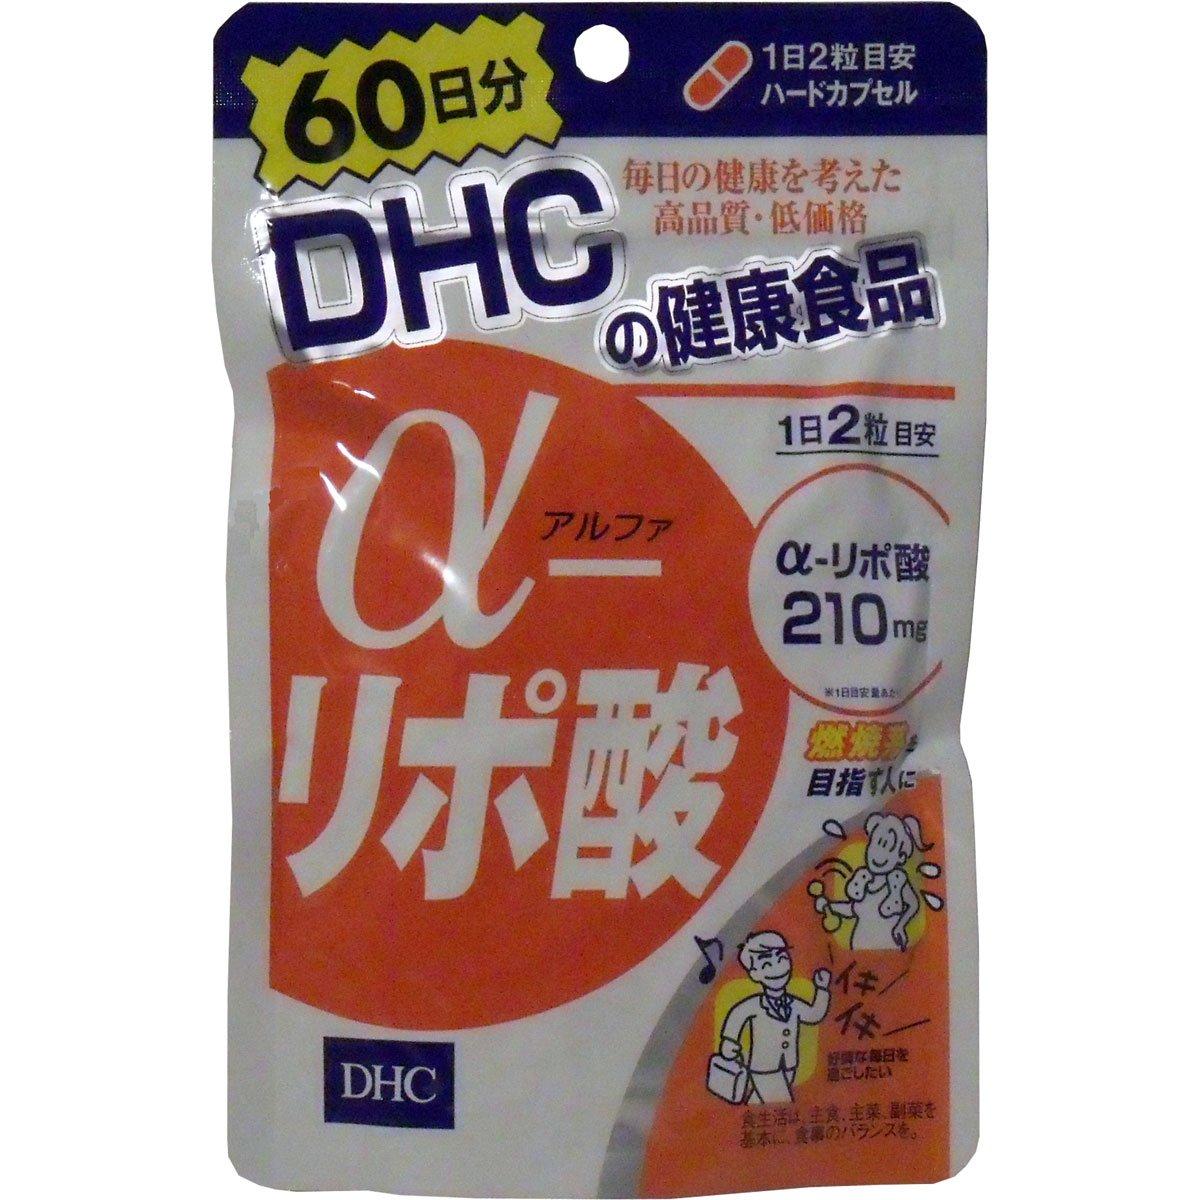 DHC α-リポ酸 α-リポ酸は、もともと体内にあるエネルギー活性成分 120粒 60日分 【5個セット】 B00EJILDDM